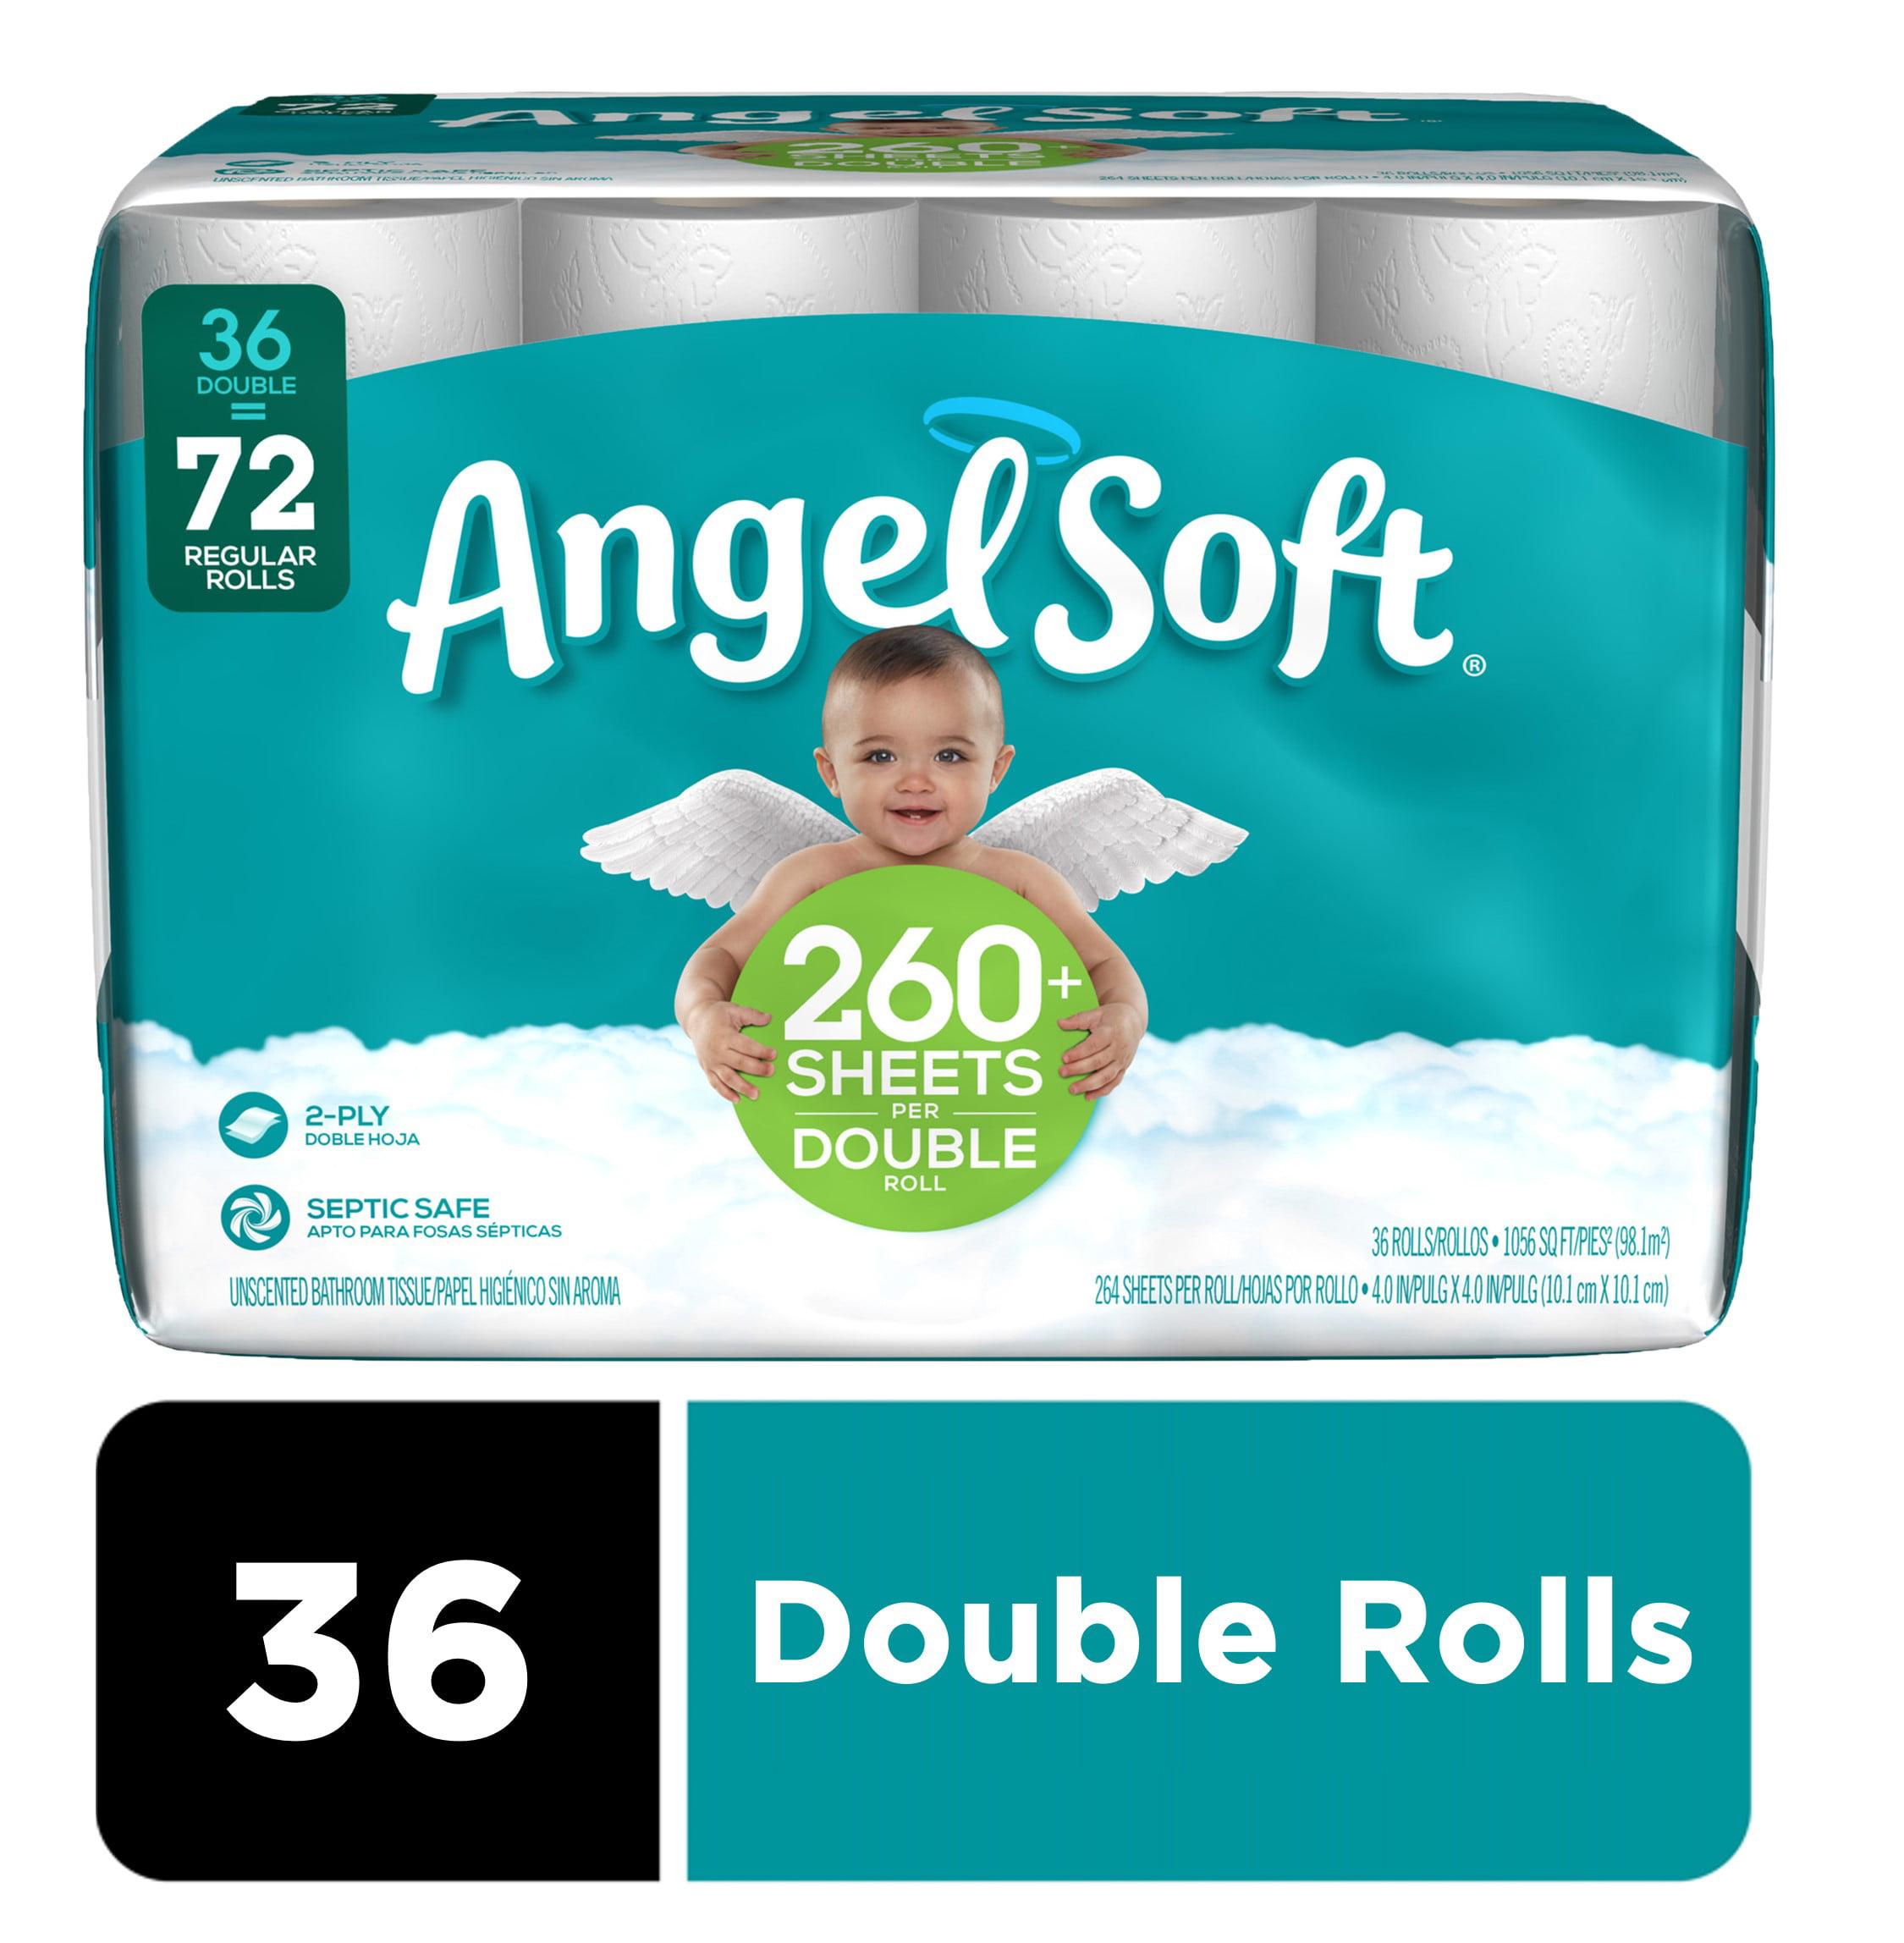 Angel Soft Toilet Paper 36 Double Rolls 72 Regular Rolls Walmart Com Walmart Com